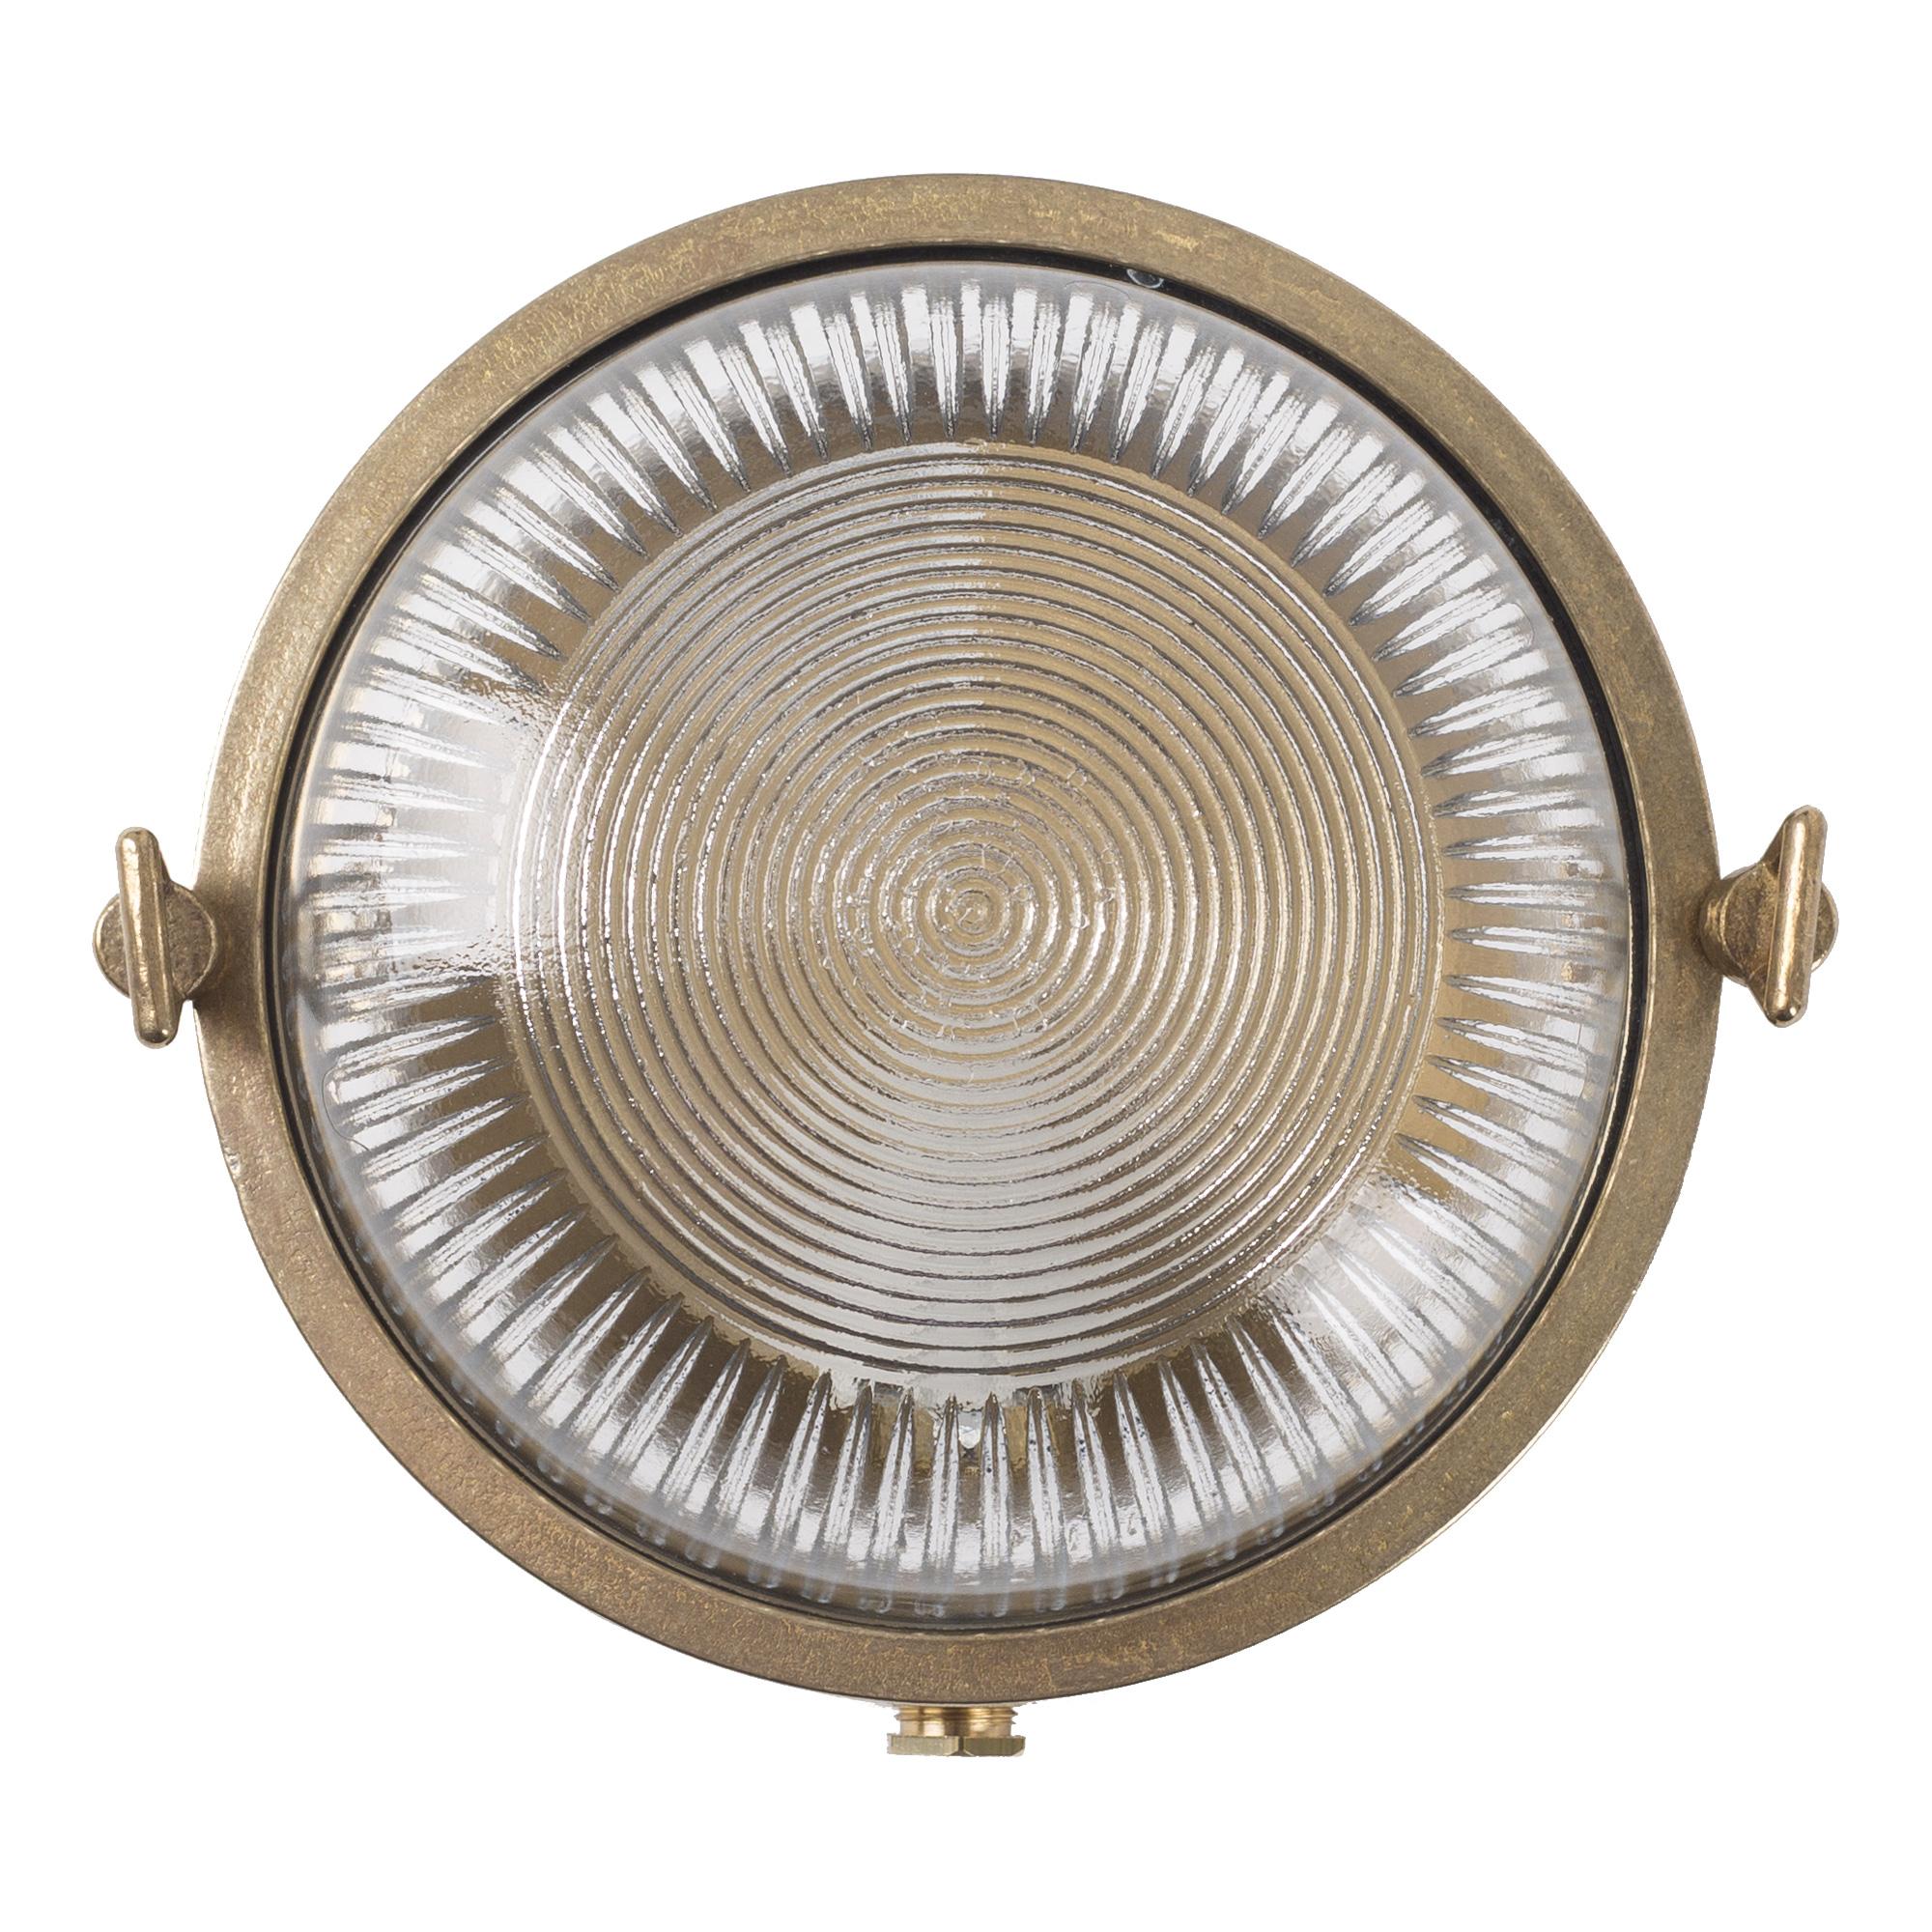 Nautic Lights Tollo Ø 17.5cm